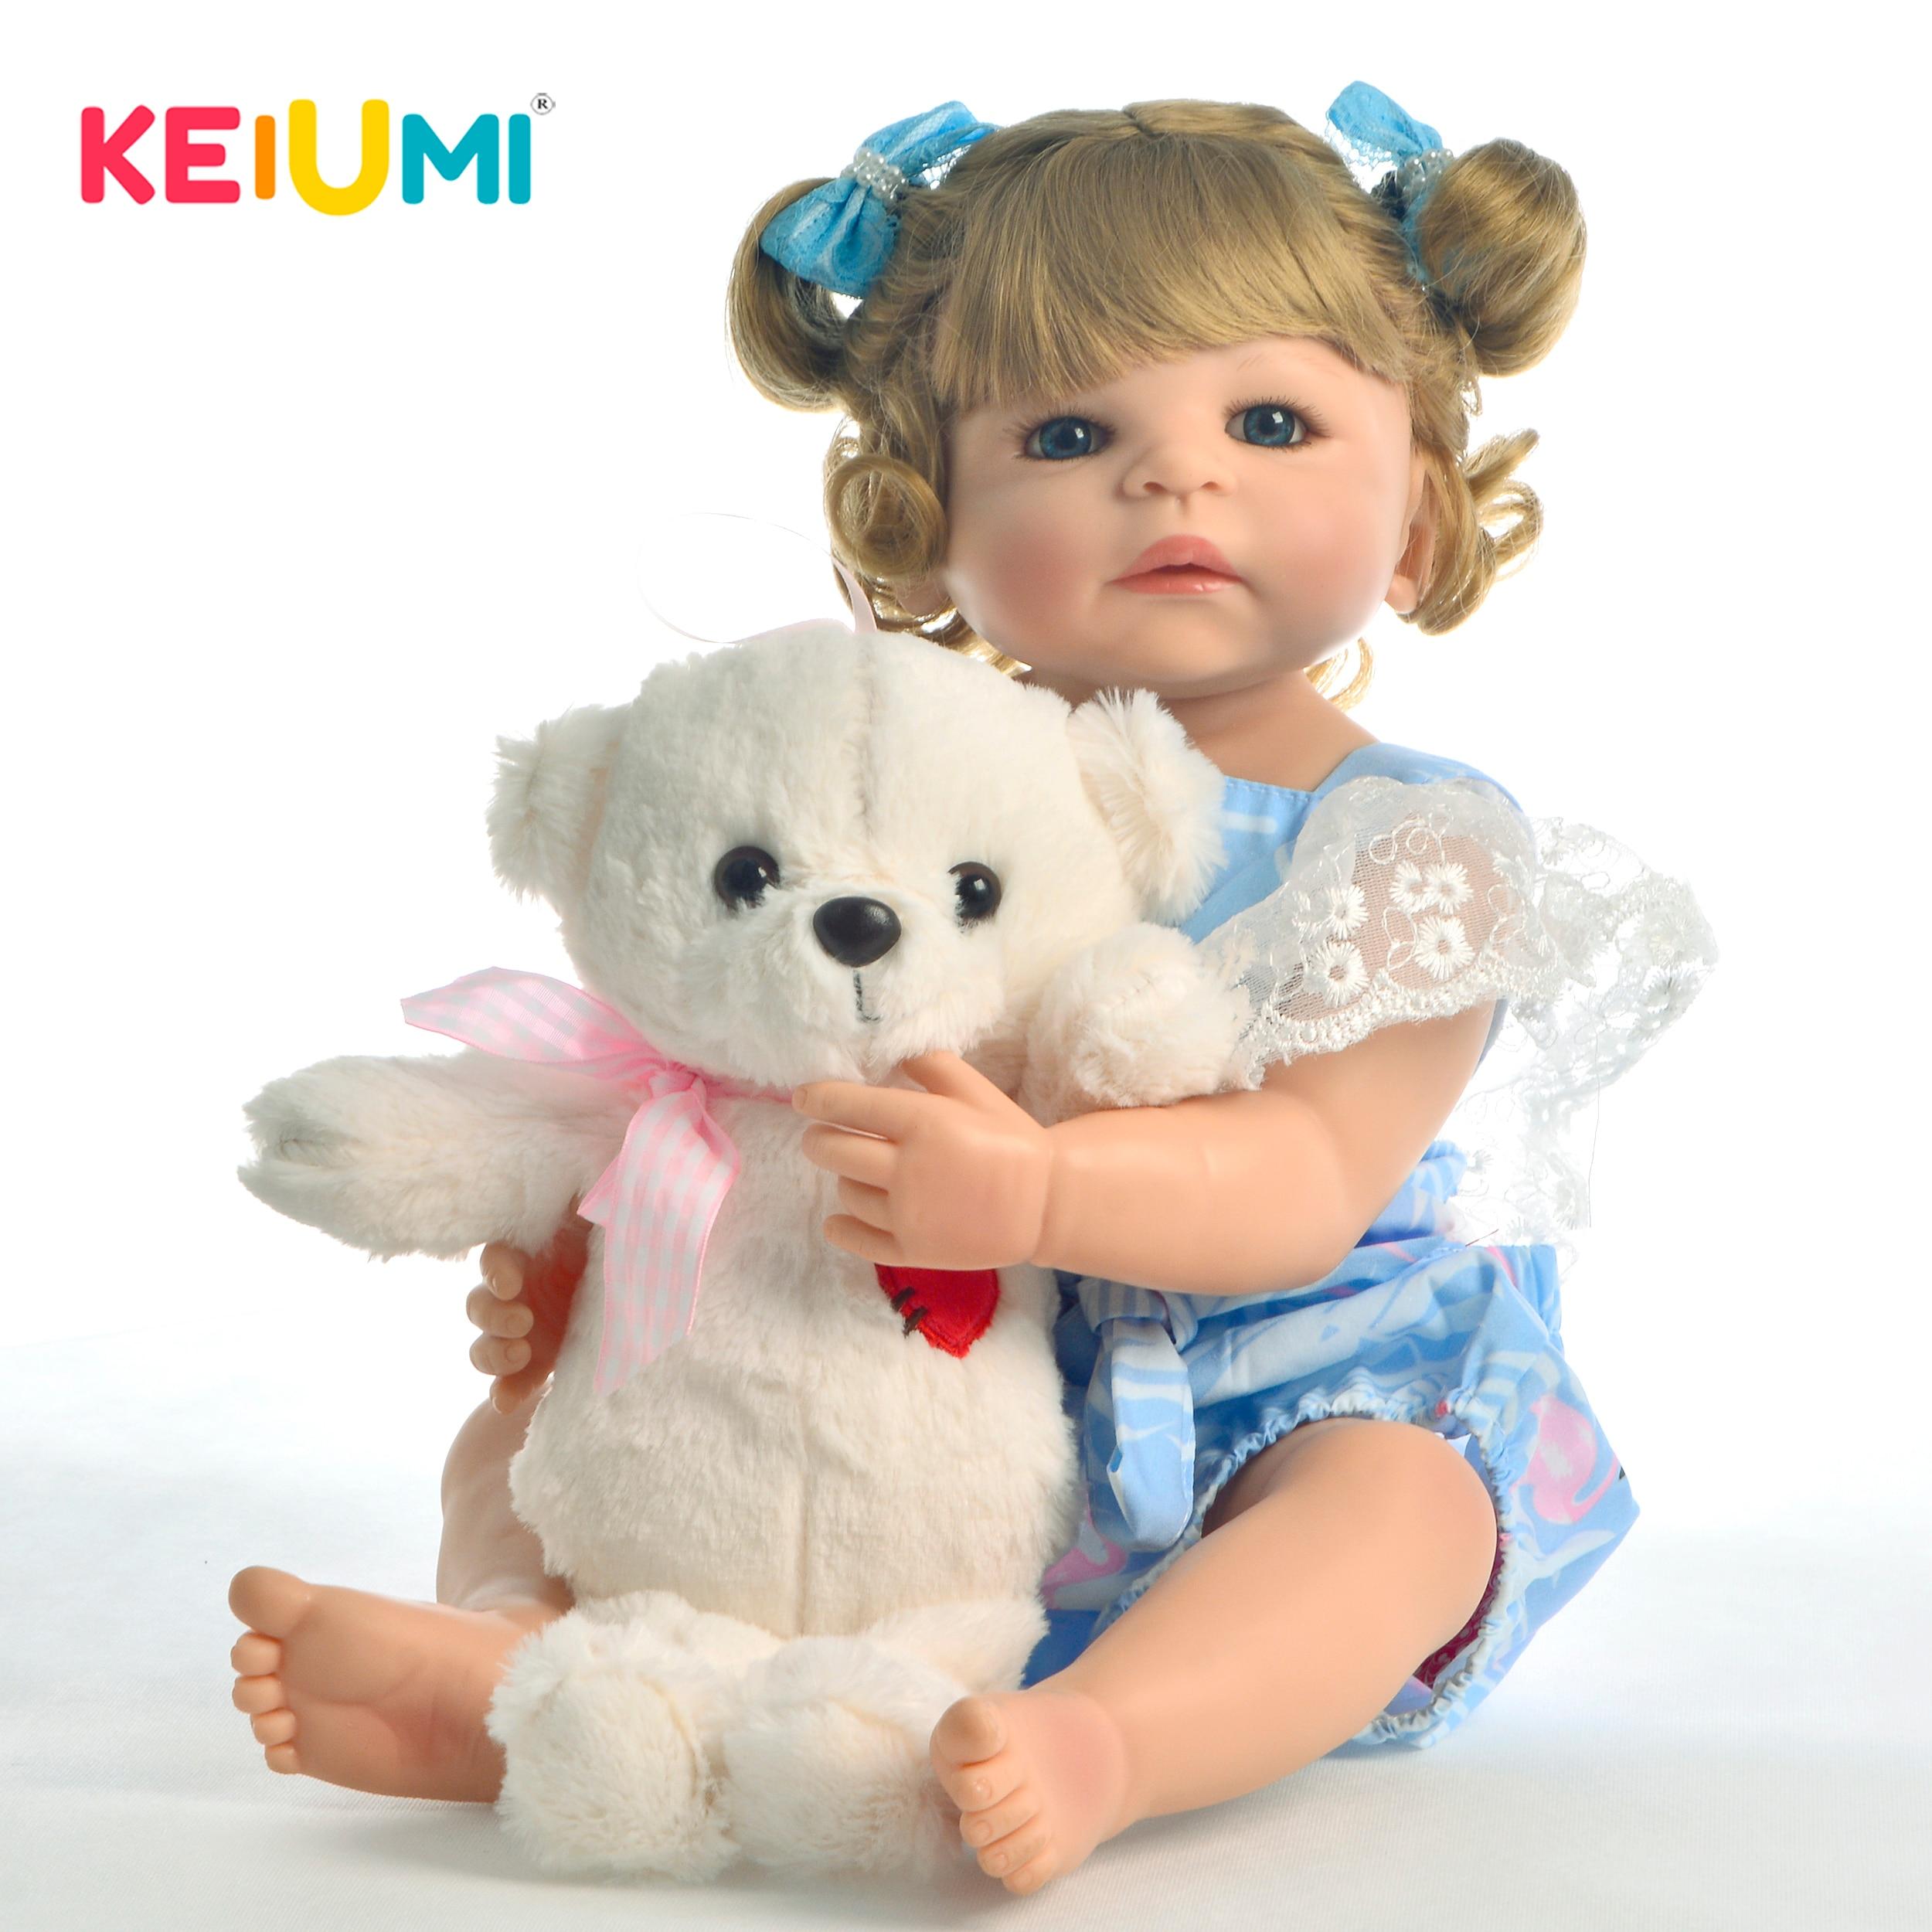 New Style 22 55cm Silicone Full Body Reborn Dolls Lifelike Princess Newborn Girl Babies Doll With